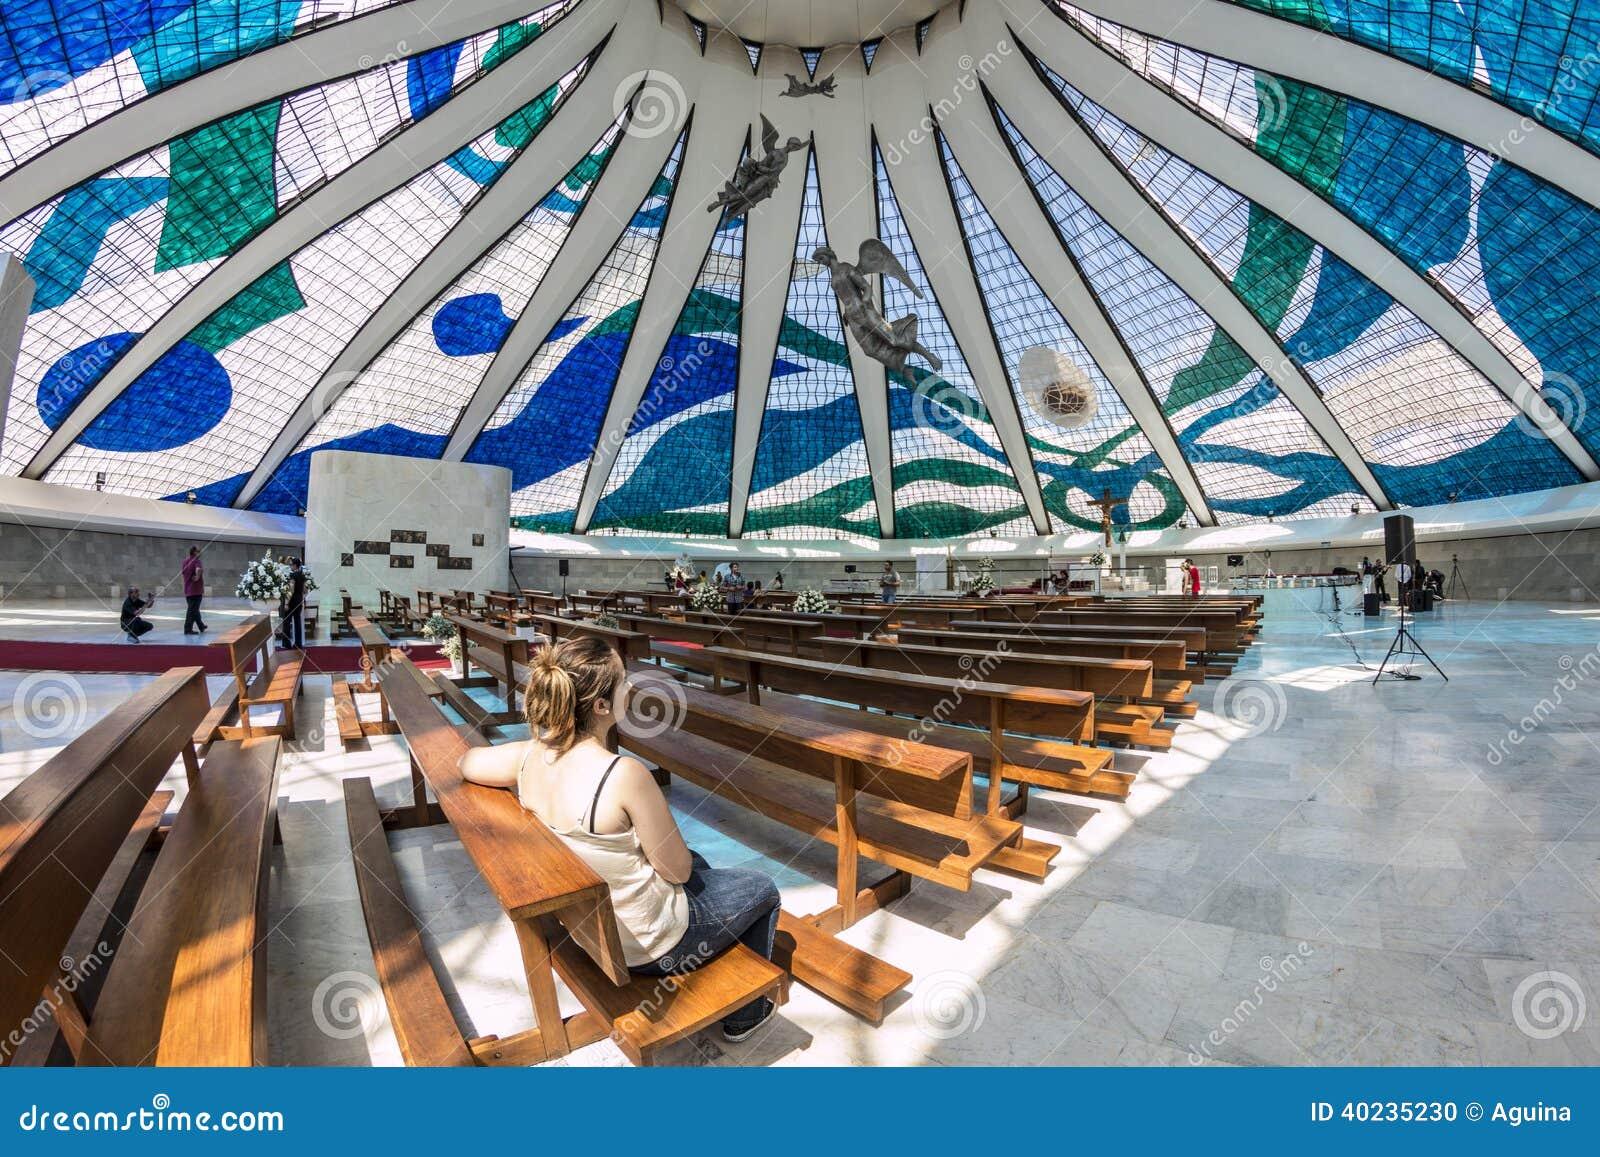 Brazilian Architect Oscar Niemeyer as well Img  721 further Stock Photo Brasilia Cathedral Braslia Df Brazil Catedral Metropolitana Nossa Senhora Aparecida Metropolitan Our Lady Aparecida Distrito Image40235230 together with Oscar Niemeyer together with 3 3 1 1 The Circular Plan. on oscar niemeyer brasilia cathedral